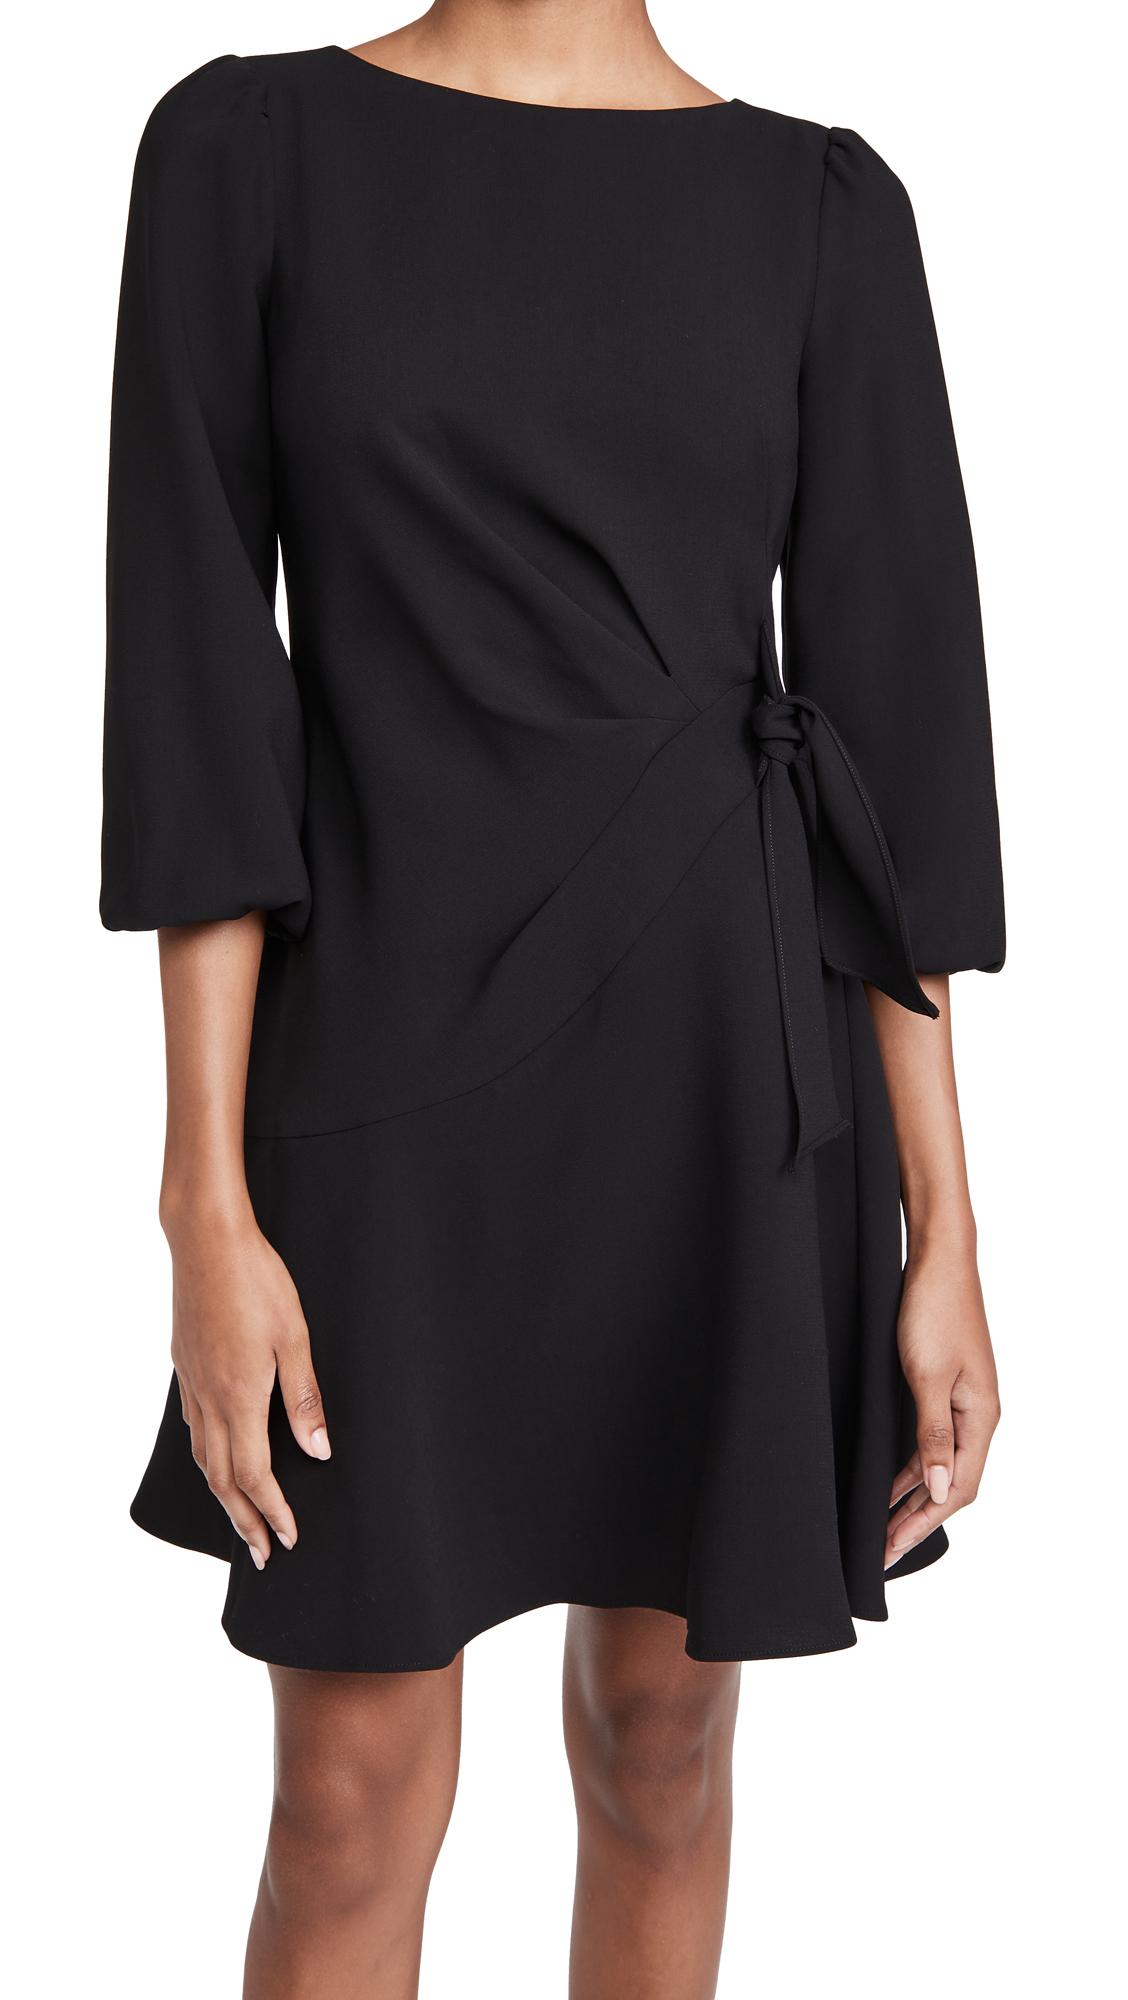 Shoshanna Abbey Dress